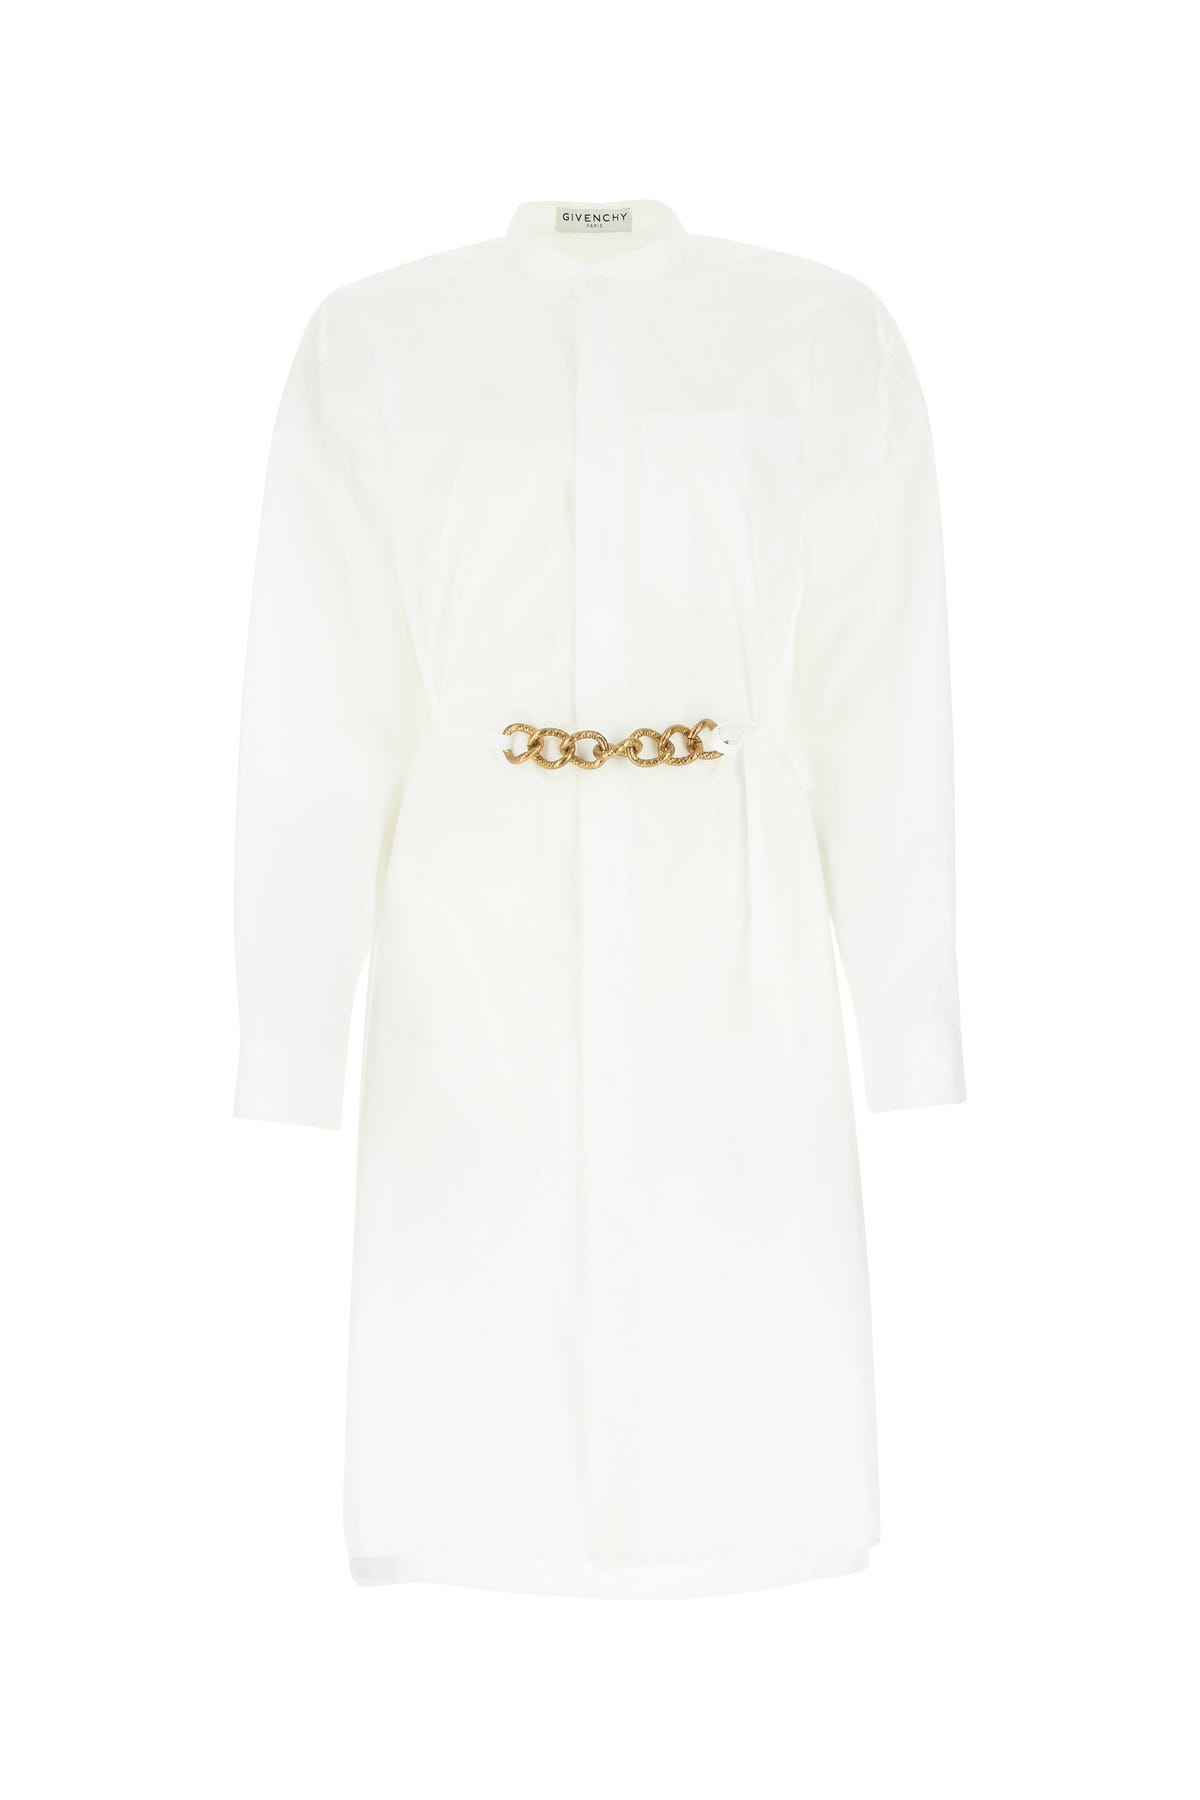 Givenchy Cottons WHITE POPLIN SHIRT DRESS WHITE GIVENCHY DONNA 36F